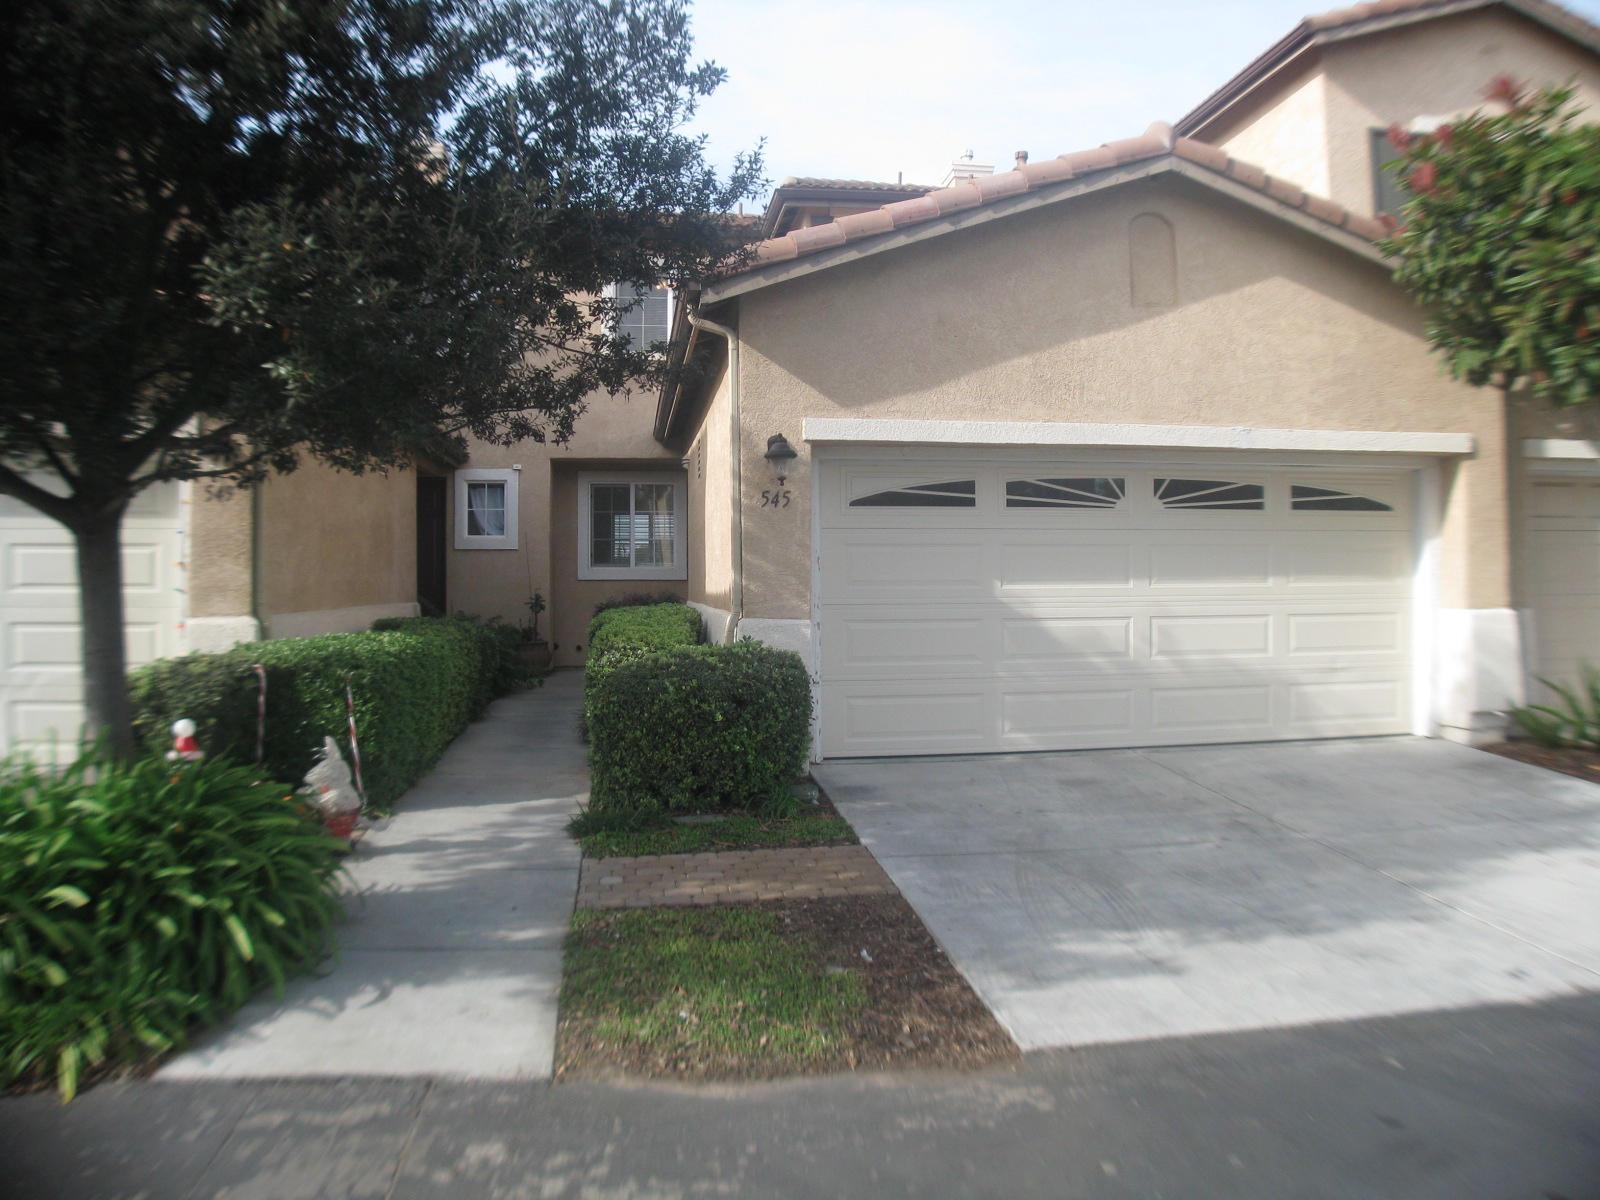 Property photo for 545 Sweet Rain Pl Goleta, California 93117 - 14-2958